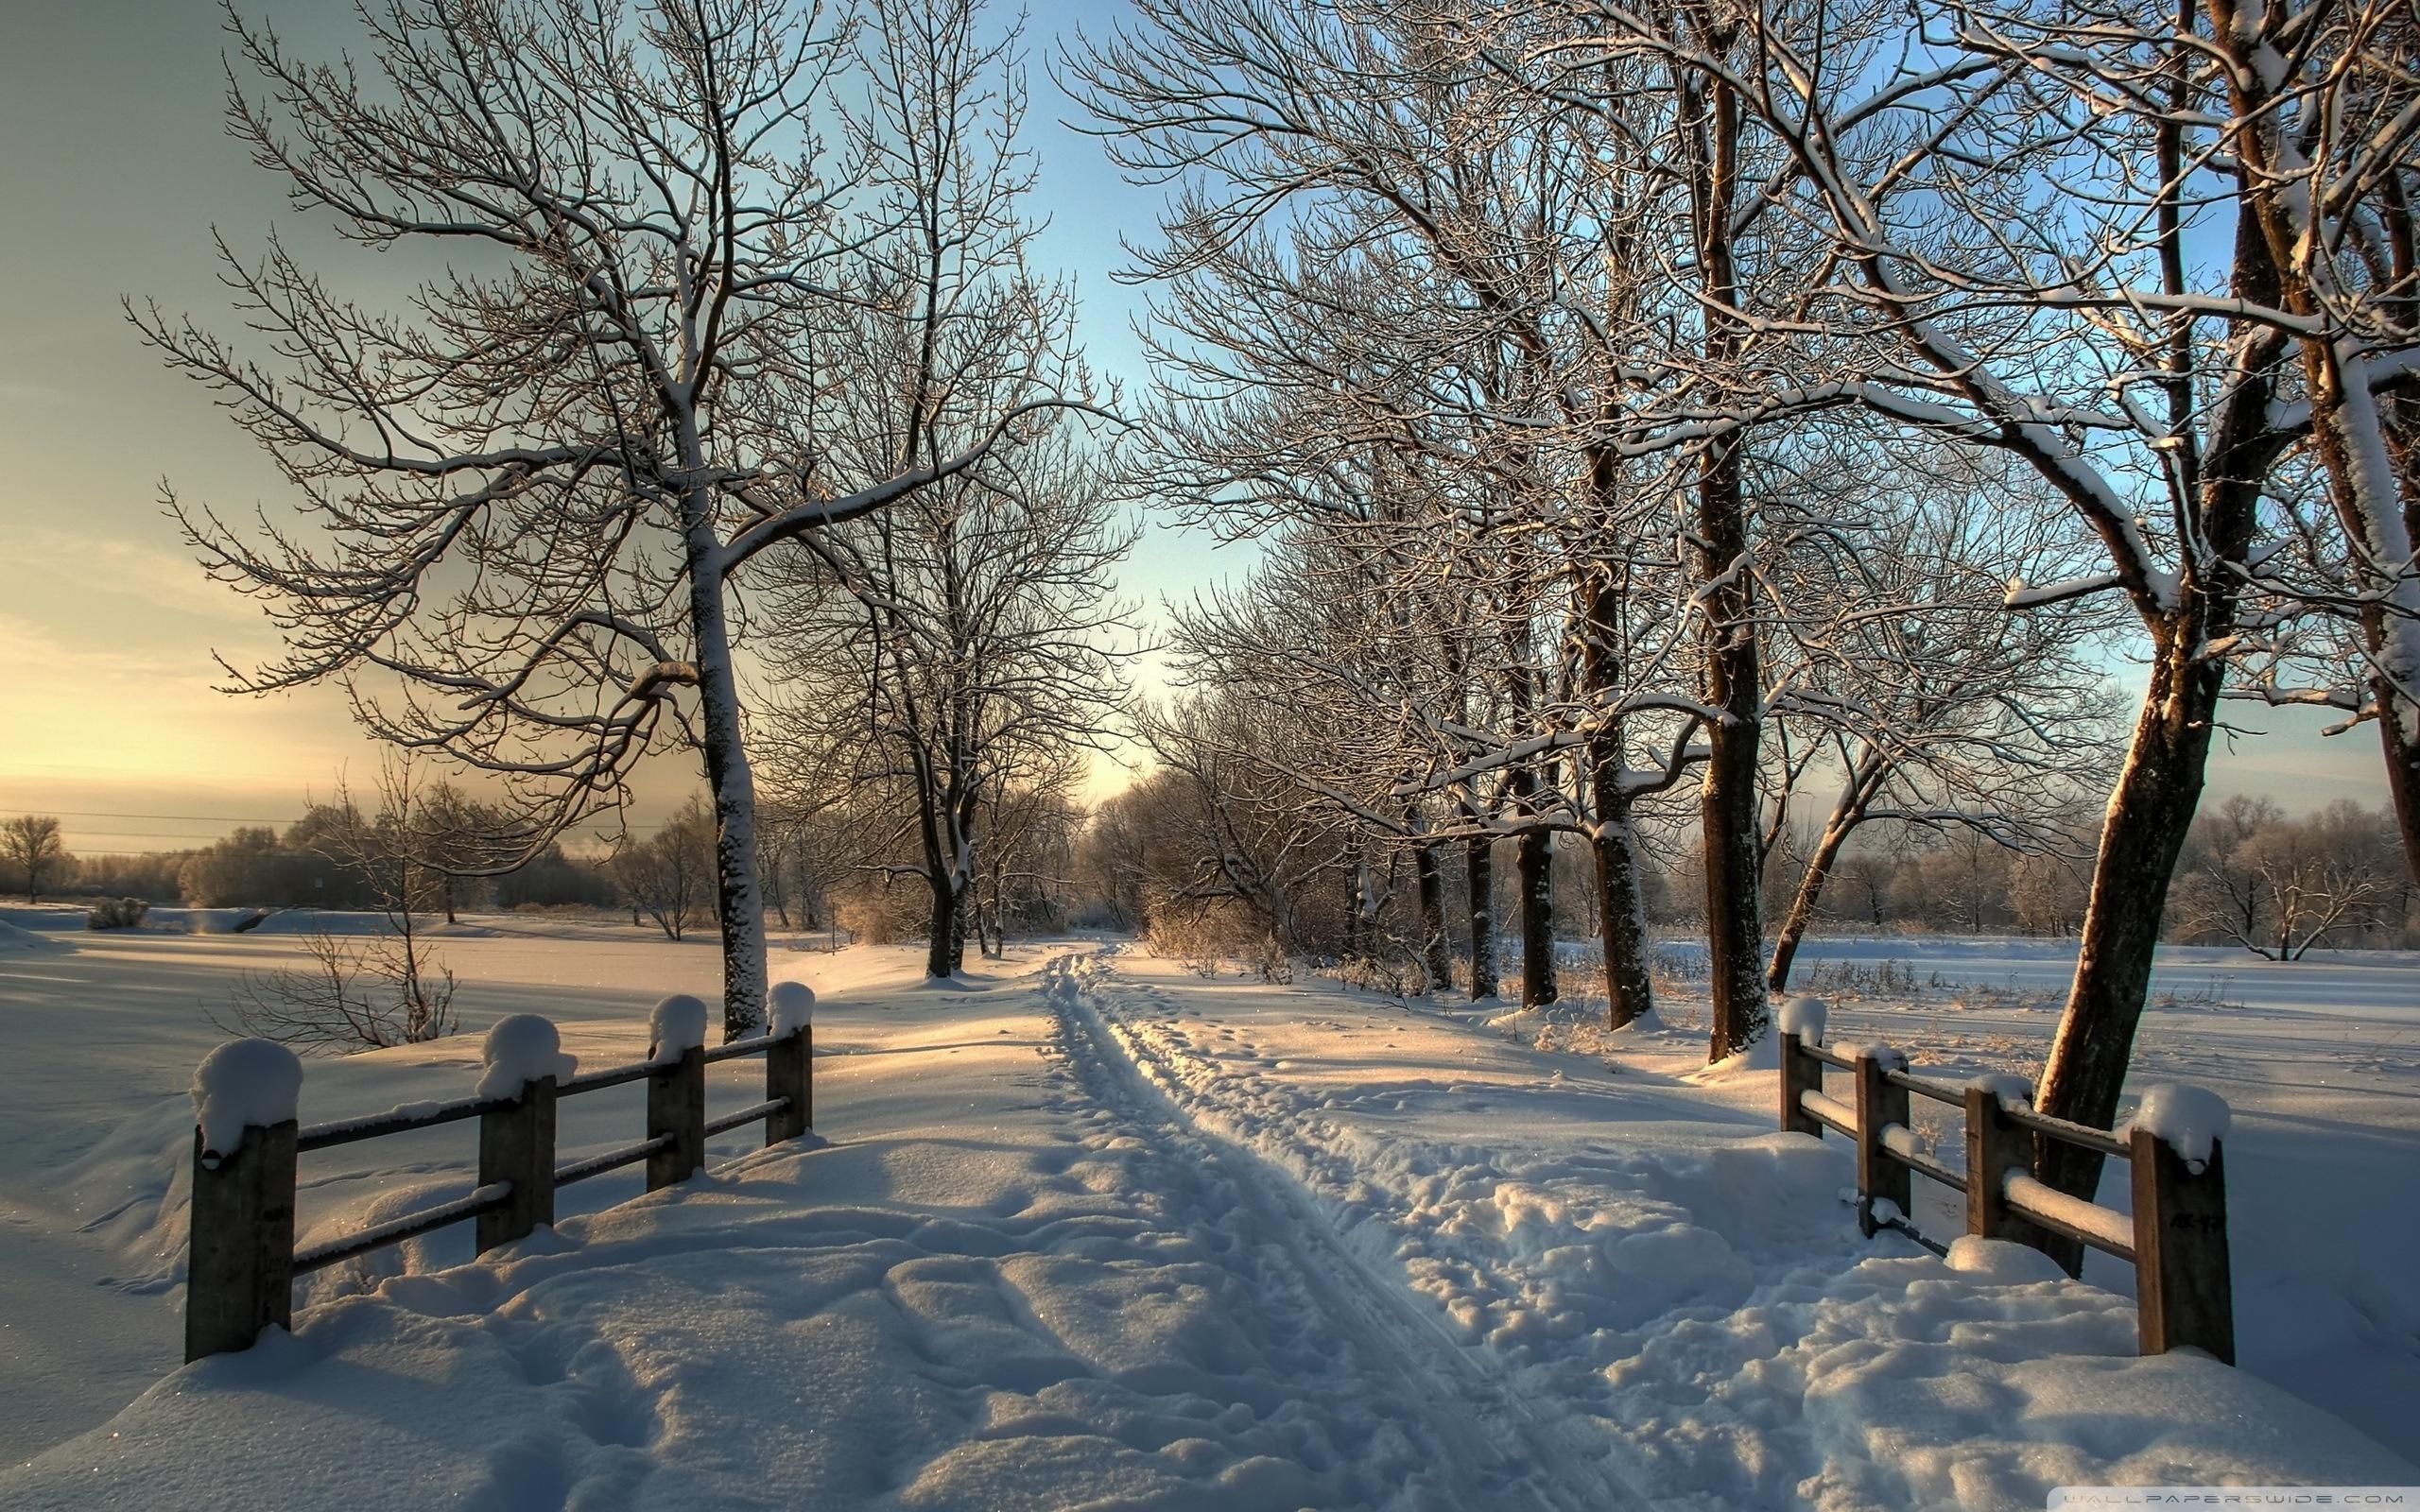 Res: 2560x1600, snowy wallpaper #468023